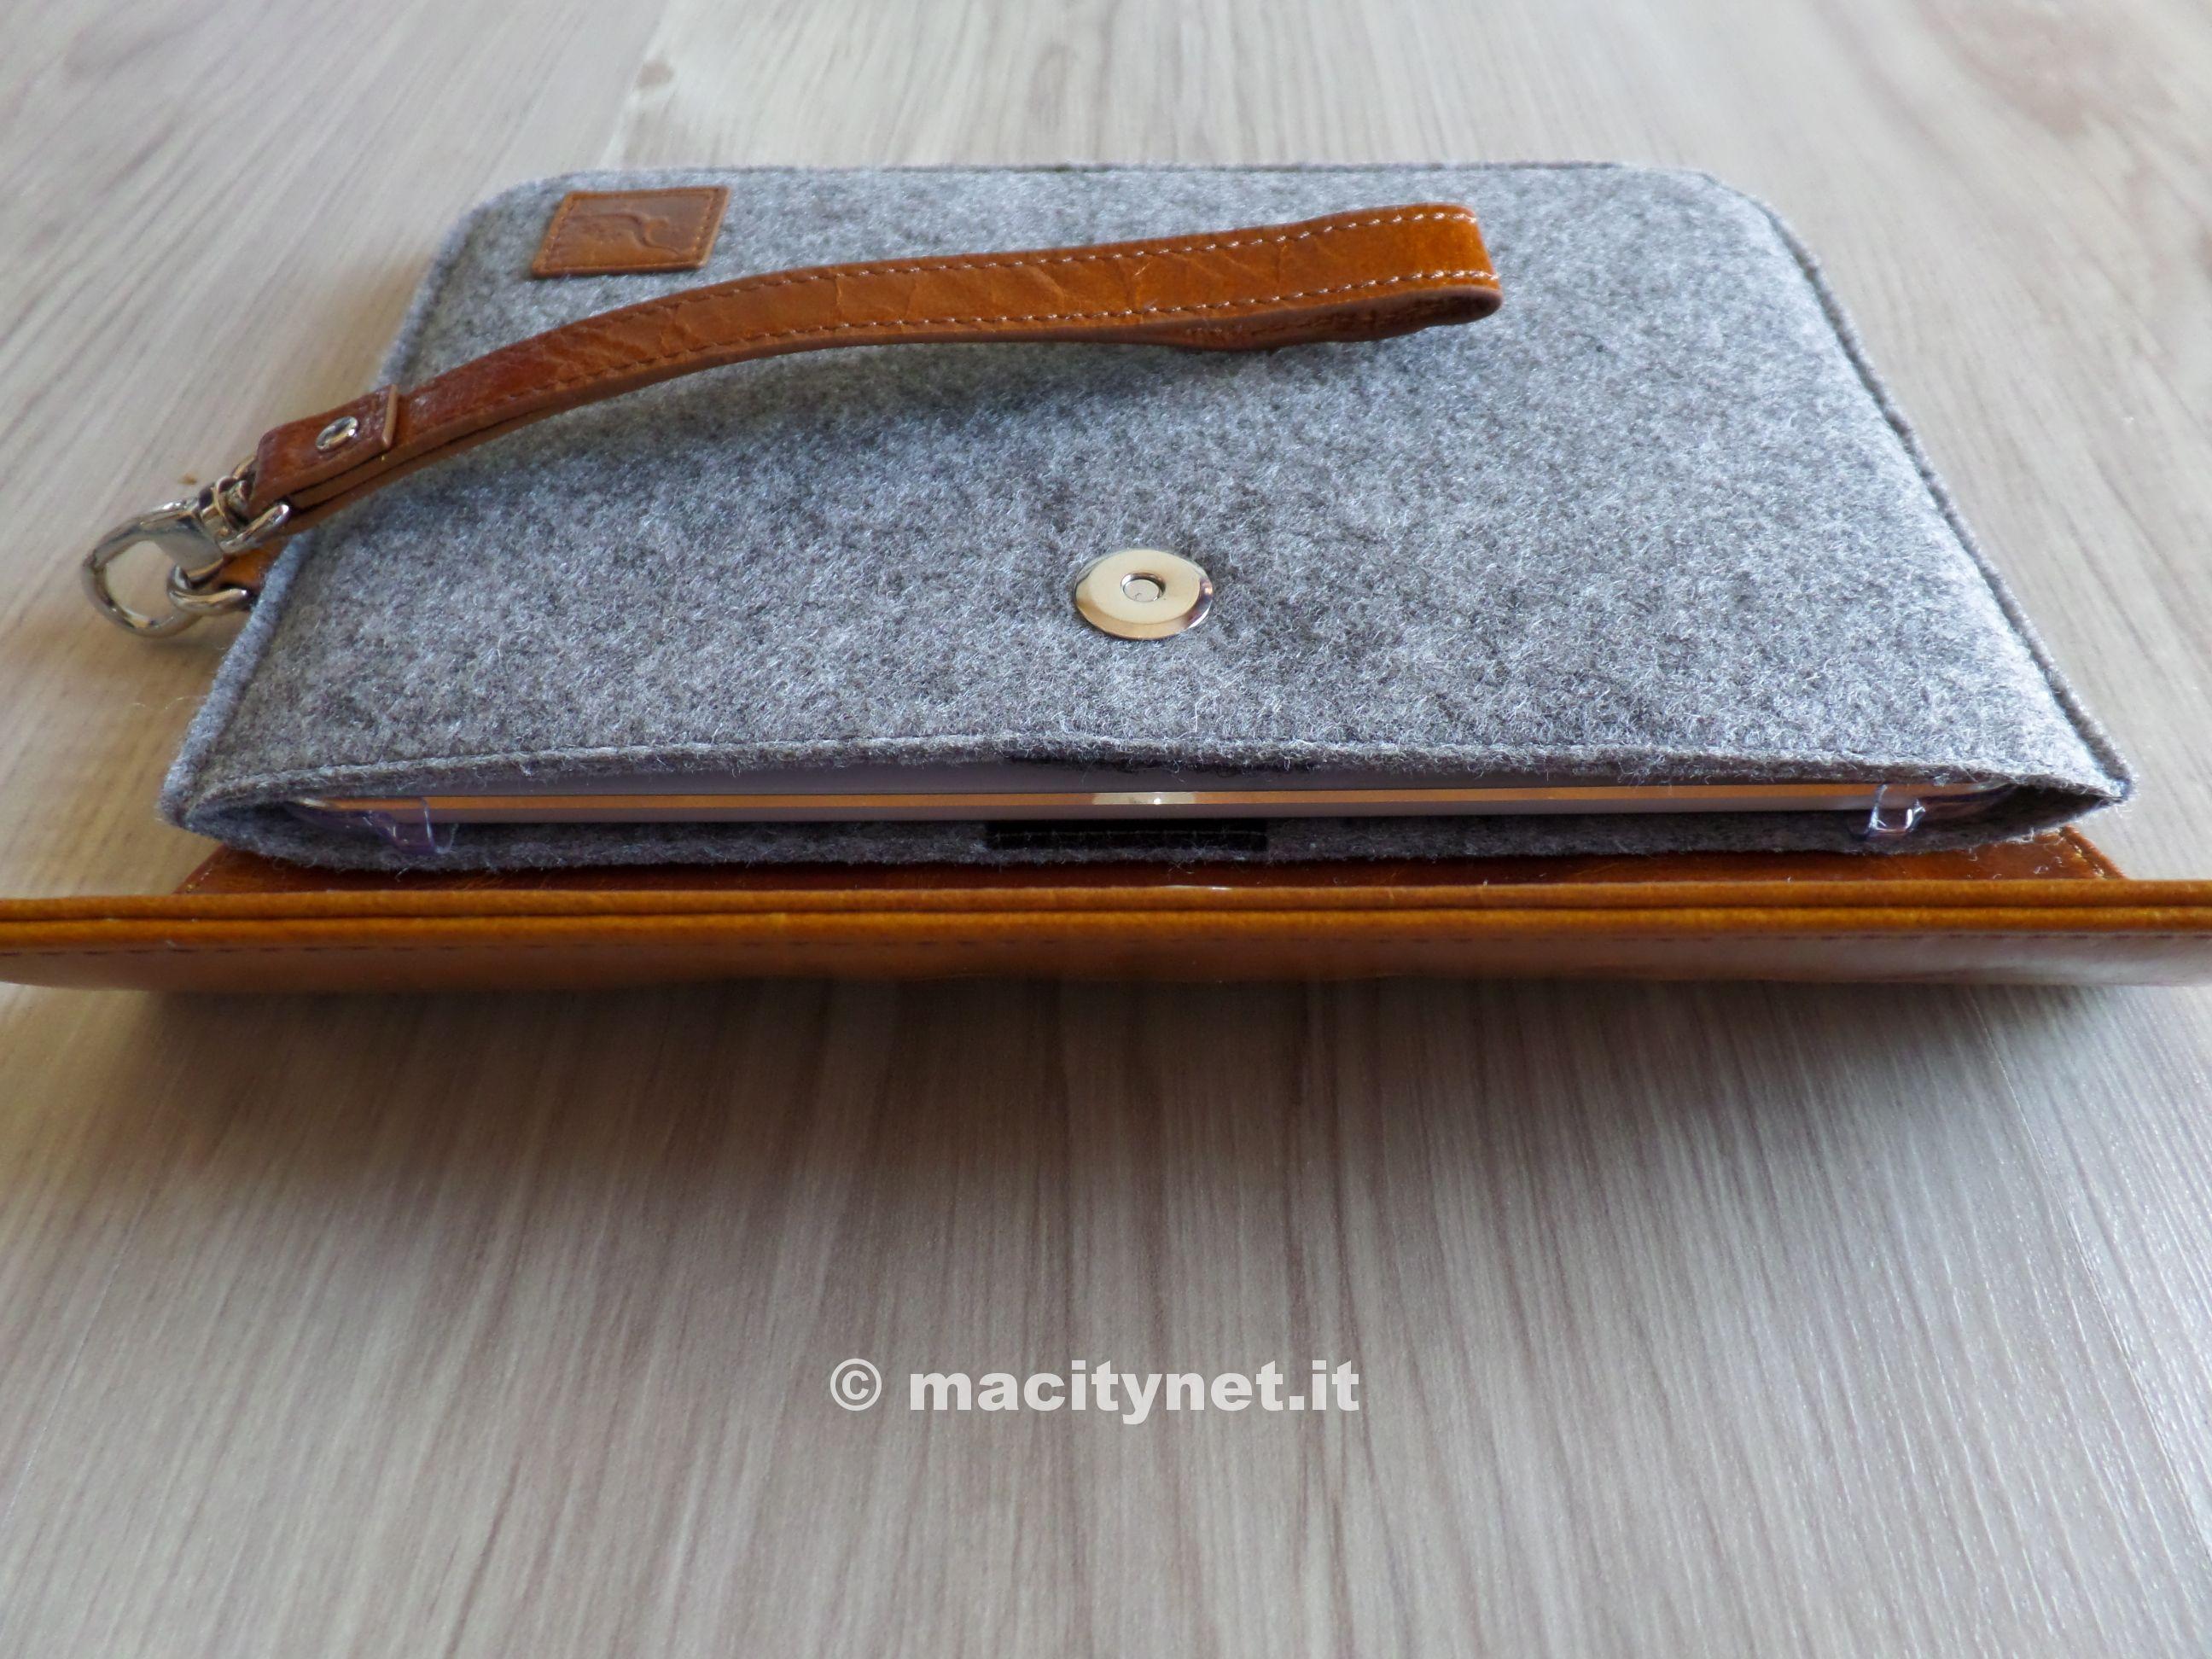 Custodia a libro in pelle sintetica per iPhone 6/6s di Gecko